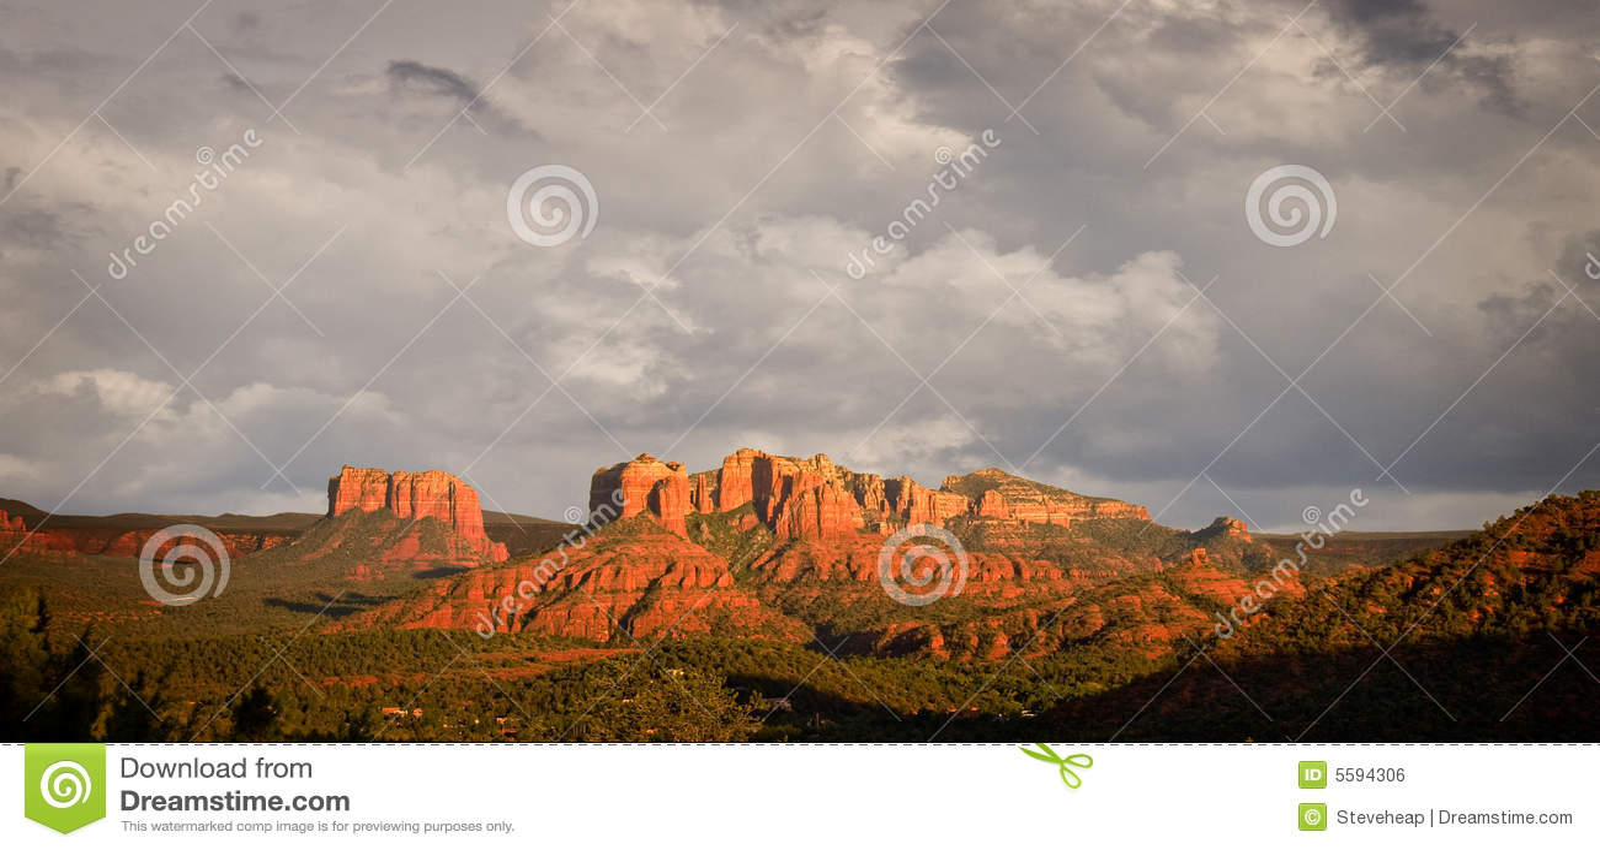 Stormy view of Sedona hills